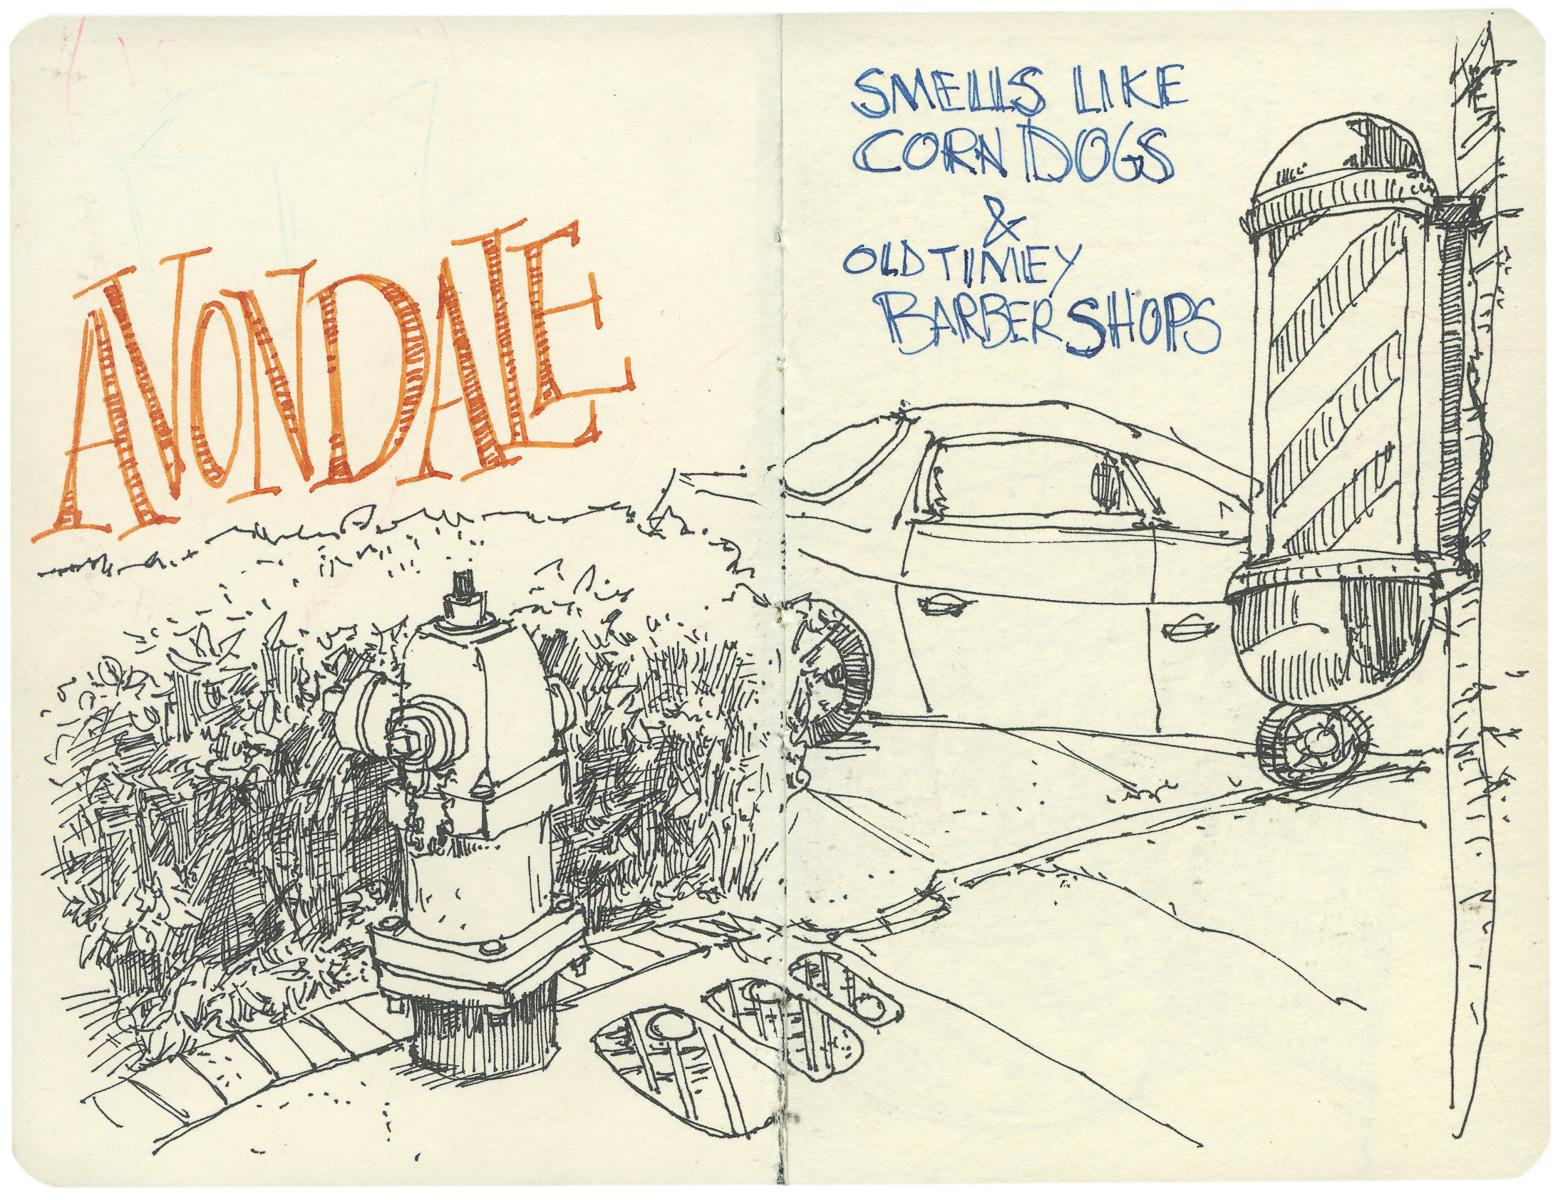 Sketchbook: Avondale